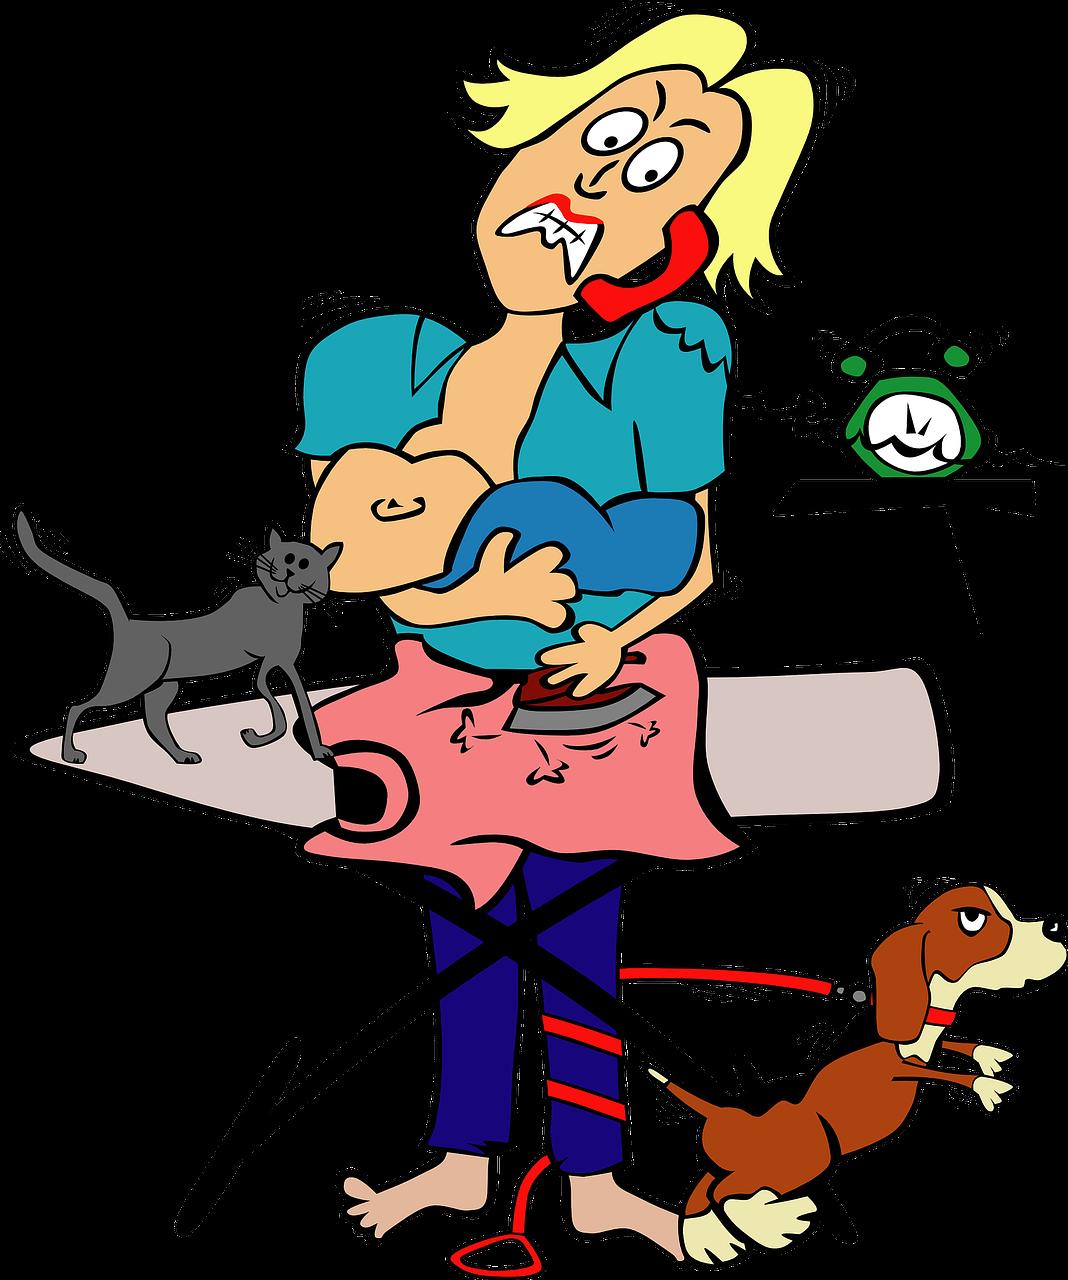 gato ferro de passar - Foto Pixabay